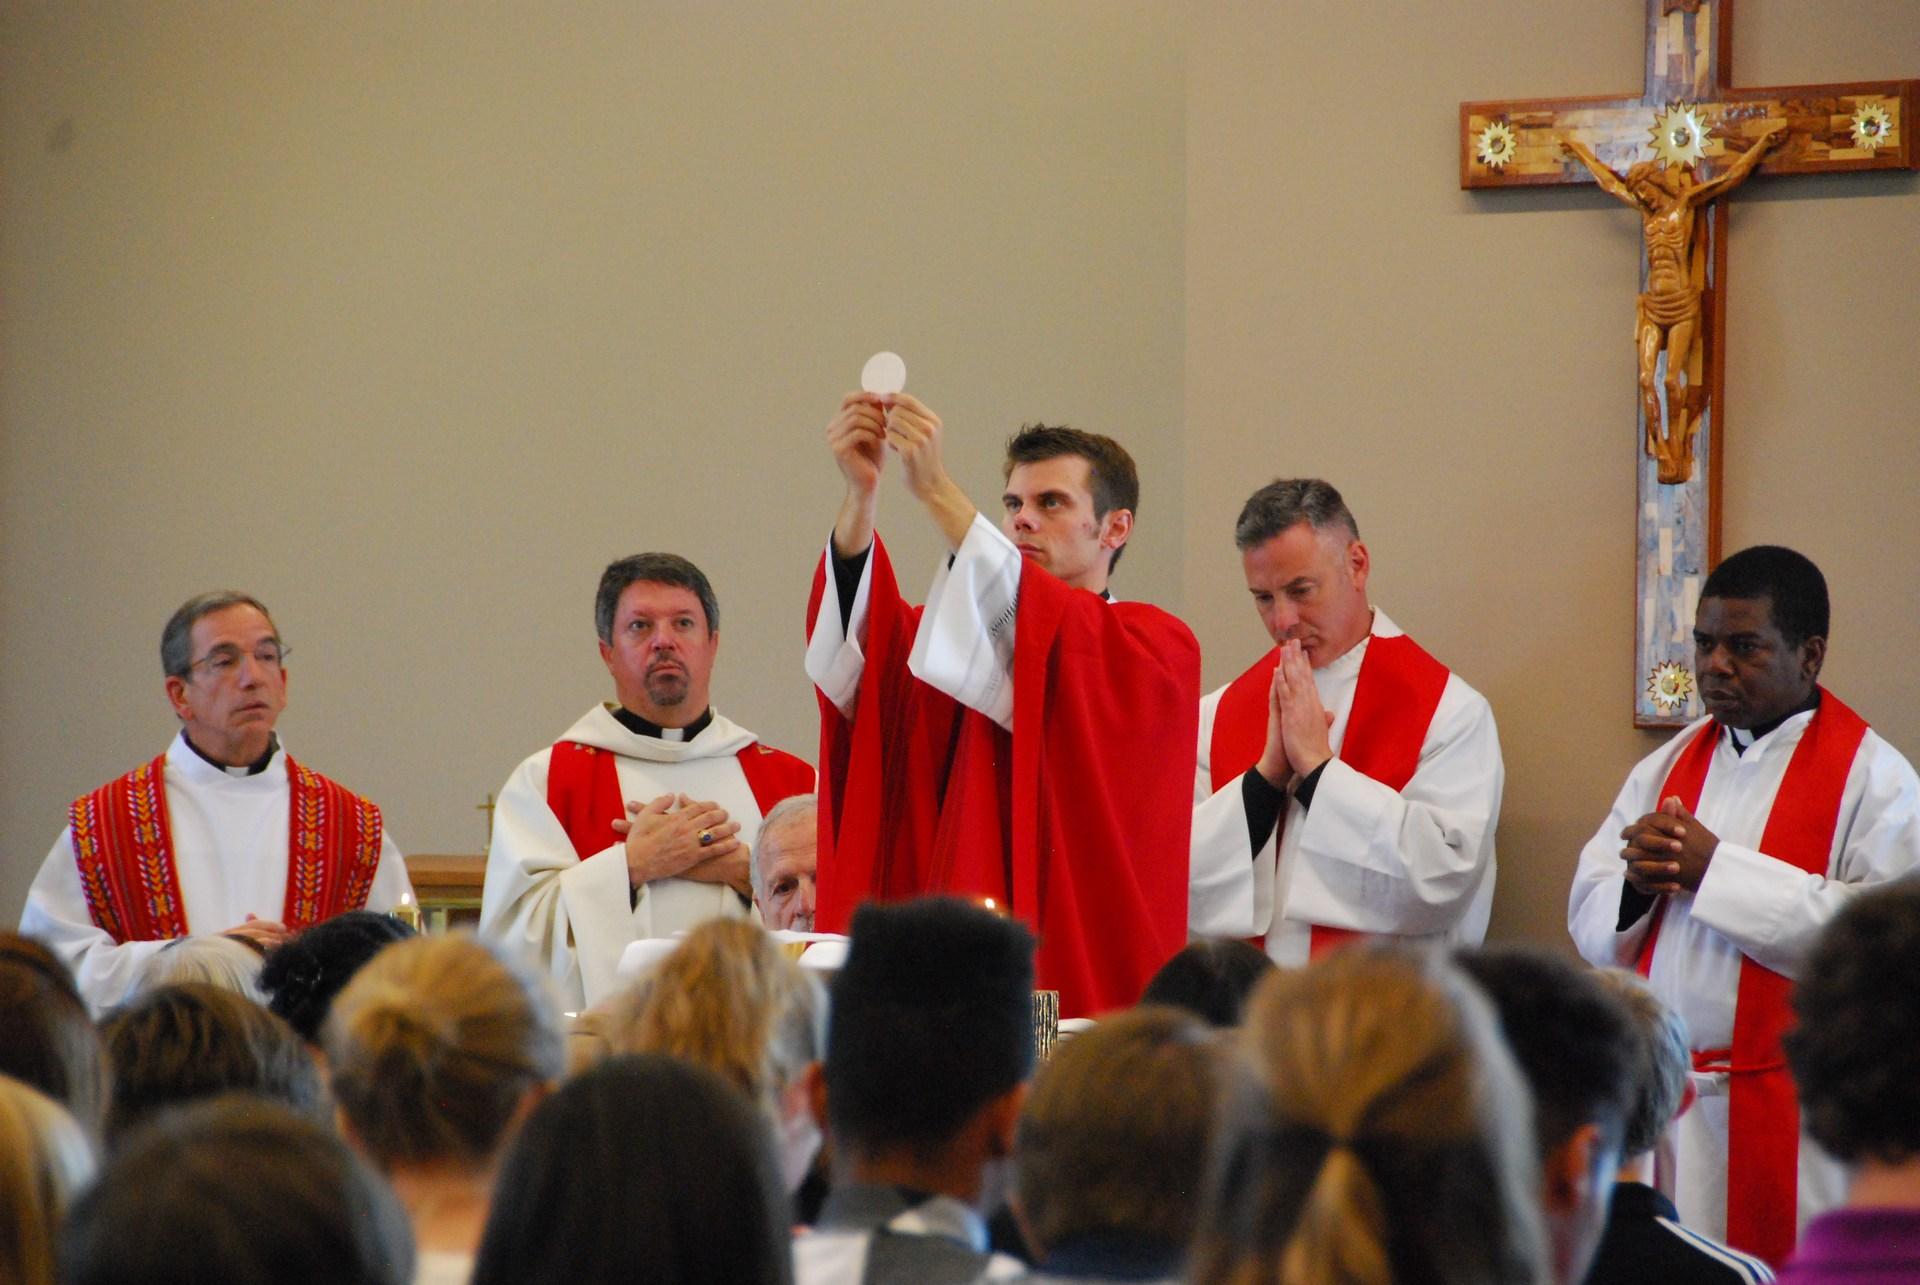 Photo of our school Chaplain, Fr. Bryan Ochs